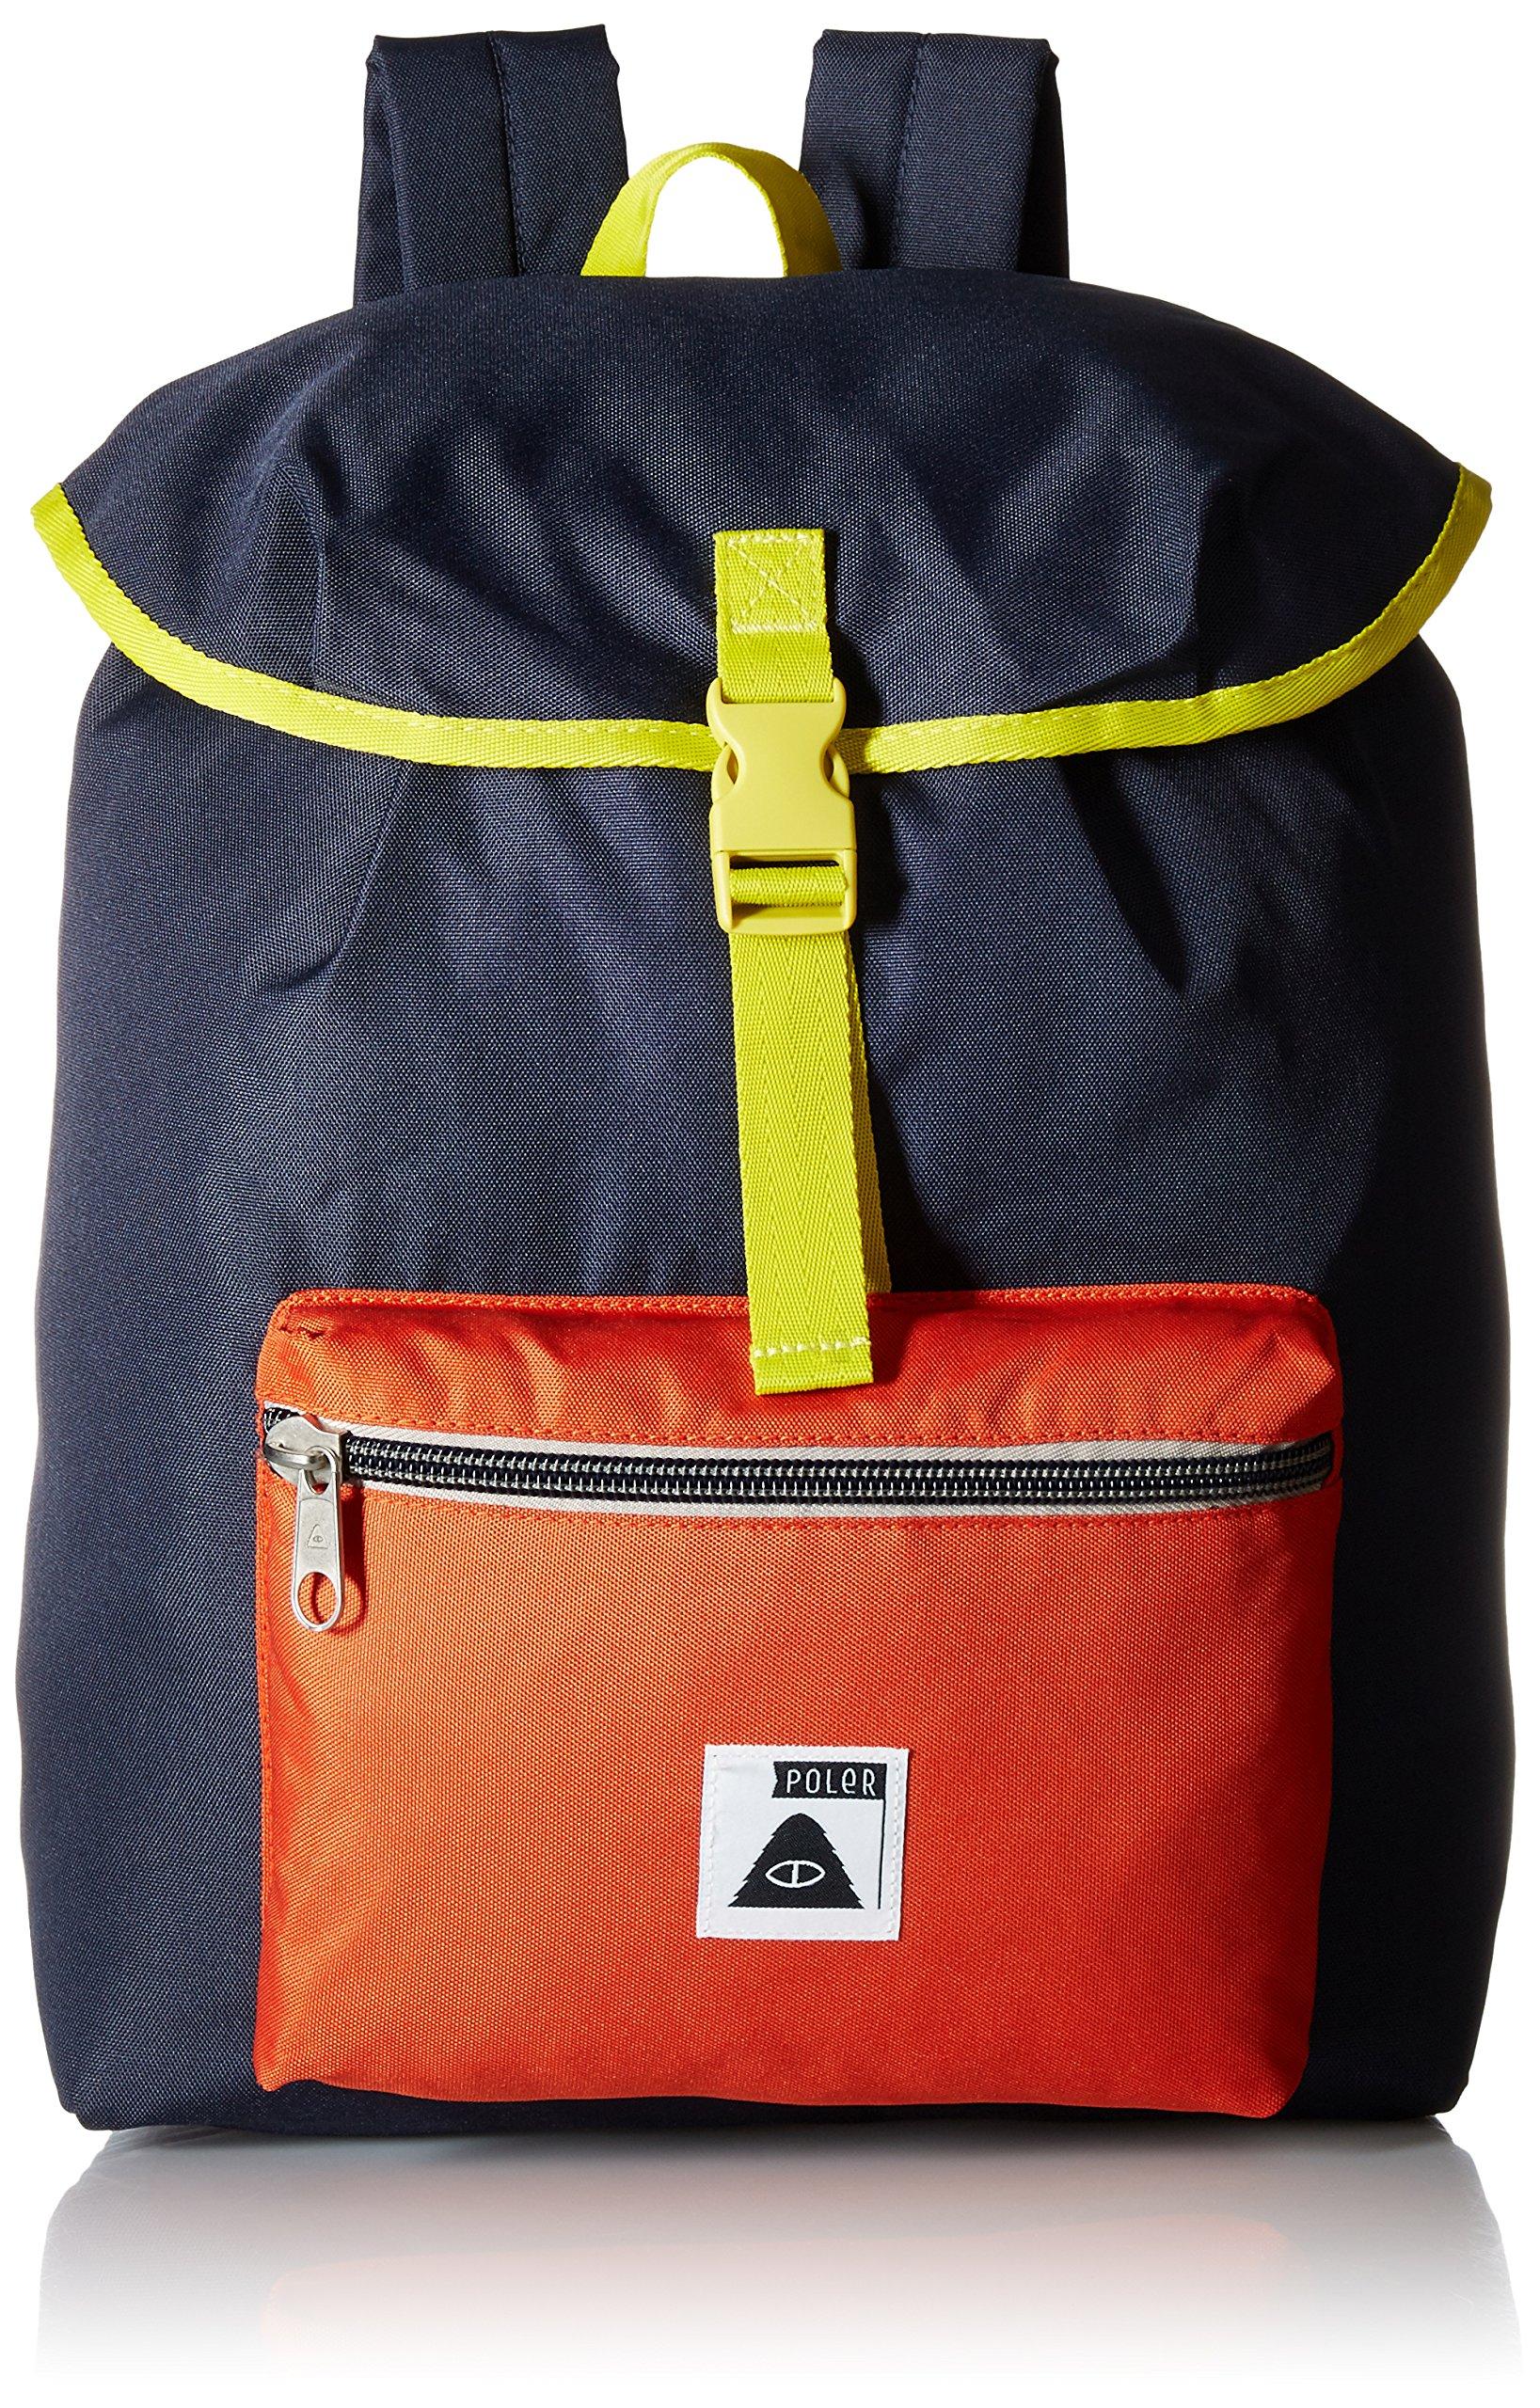 Poler Men's Field Pack Backpack, Navy, One Size